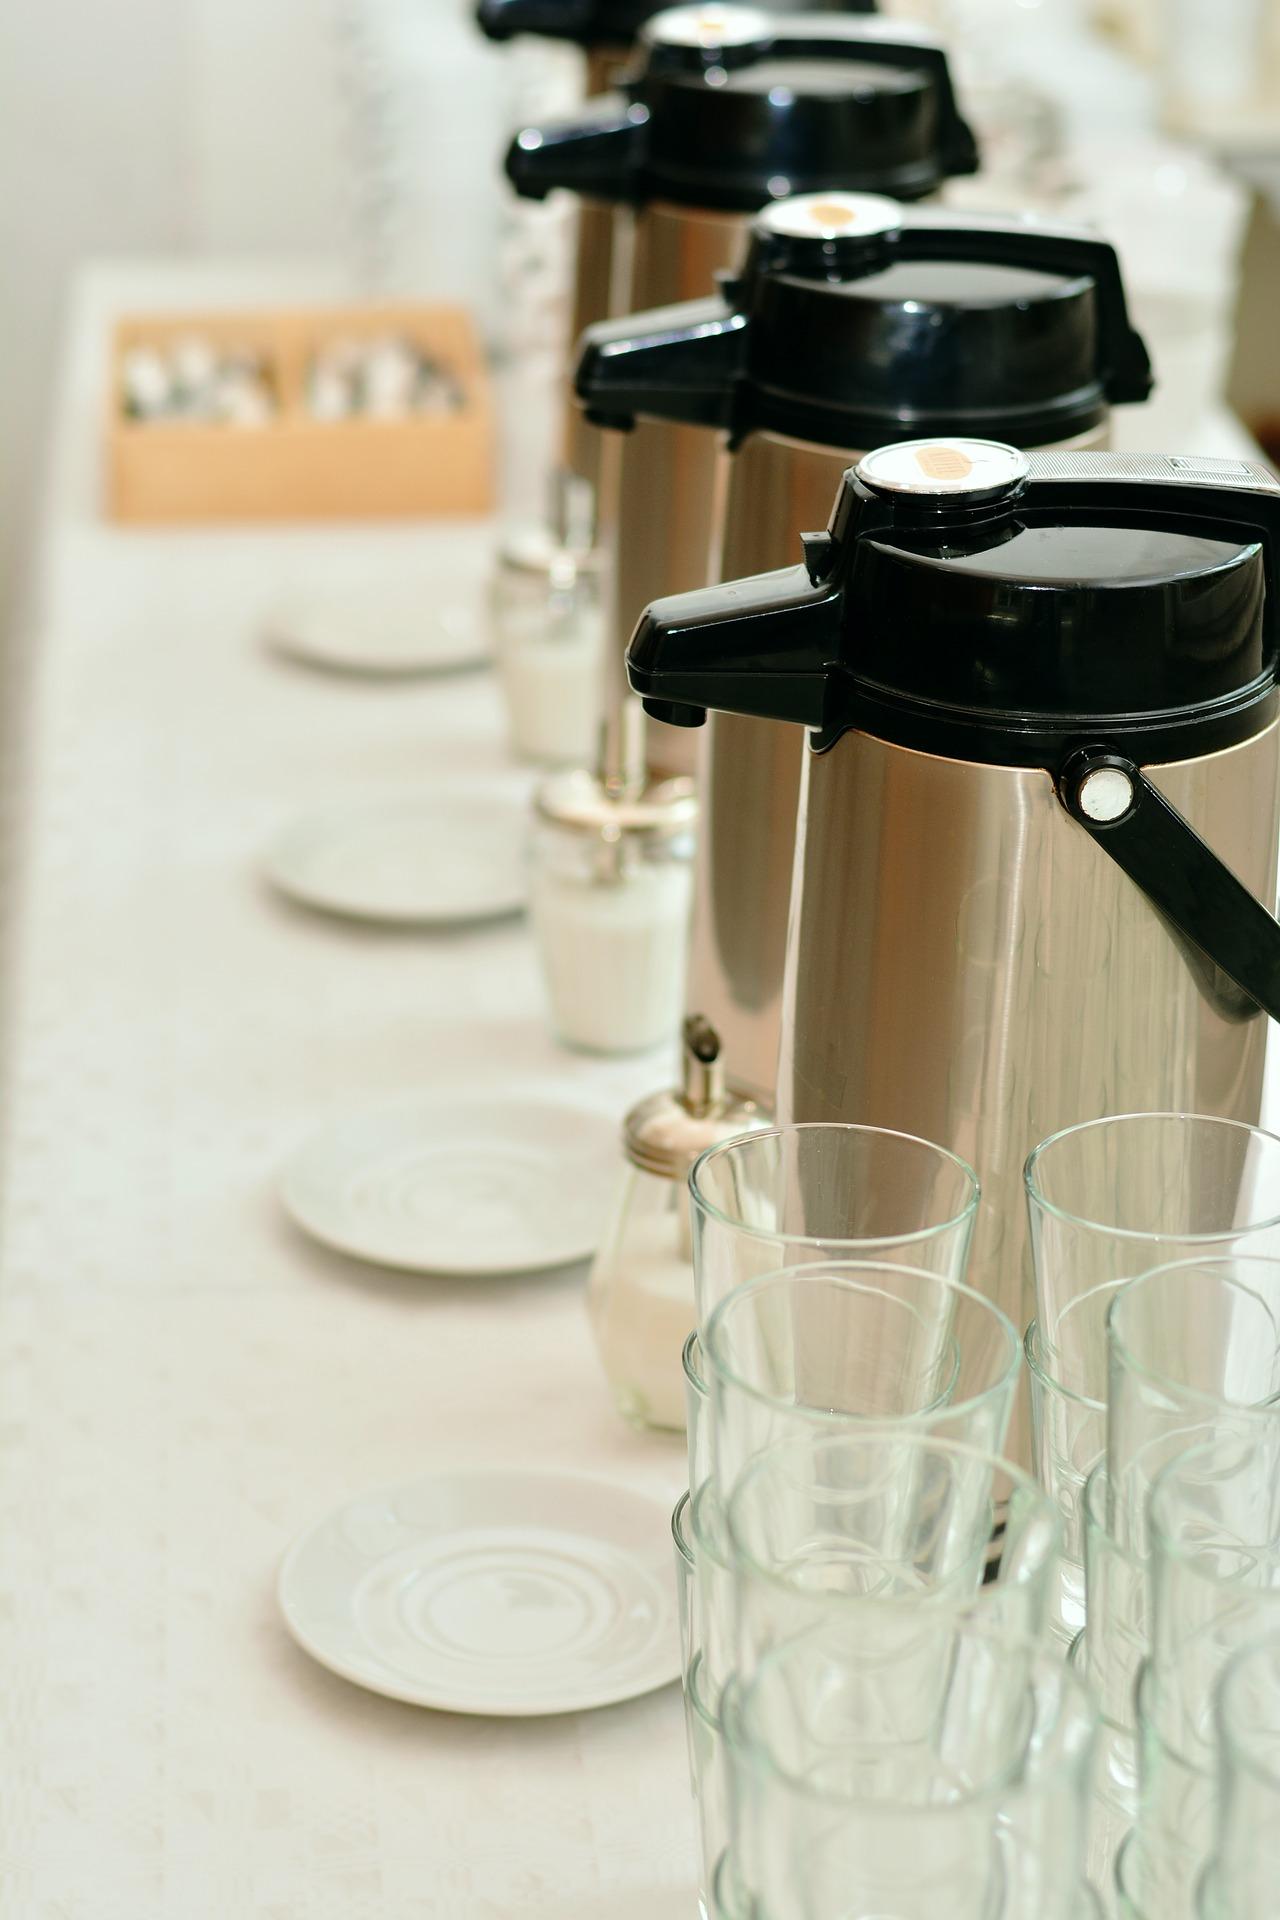 coffee-dispenser-3315998_1920.jpg